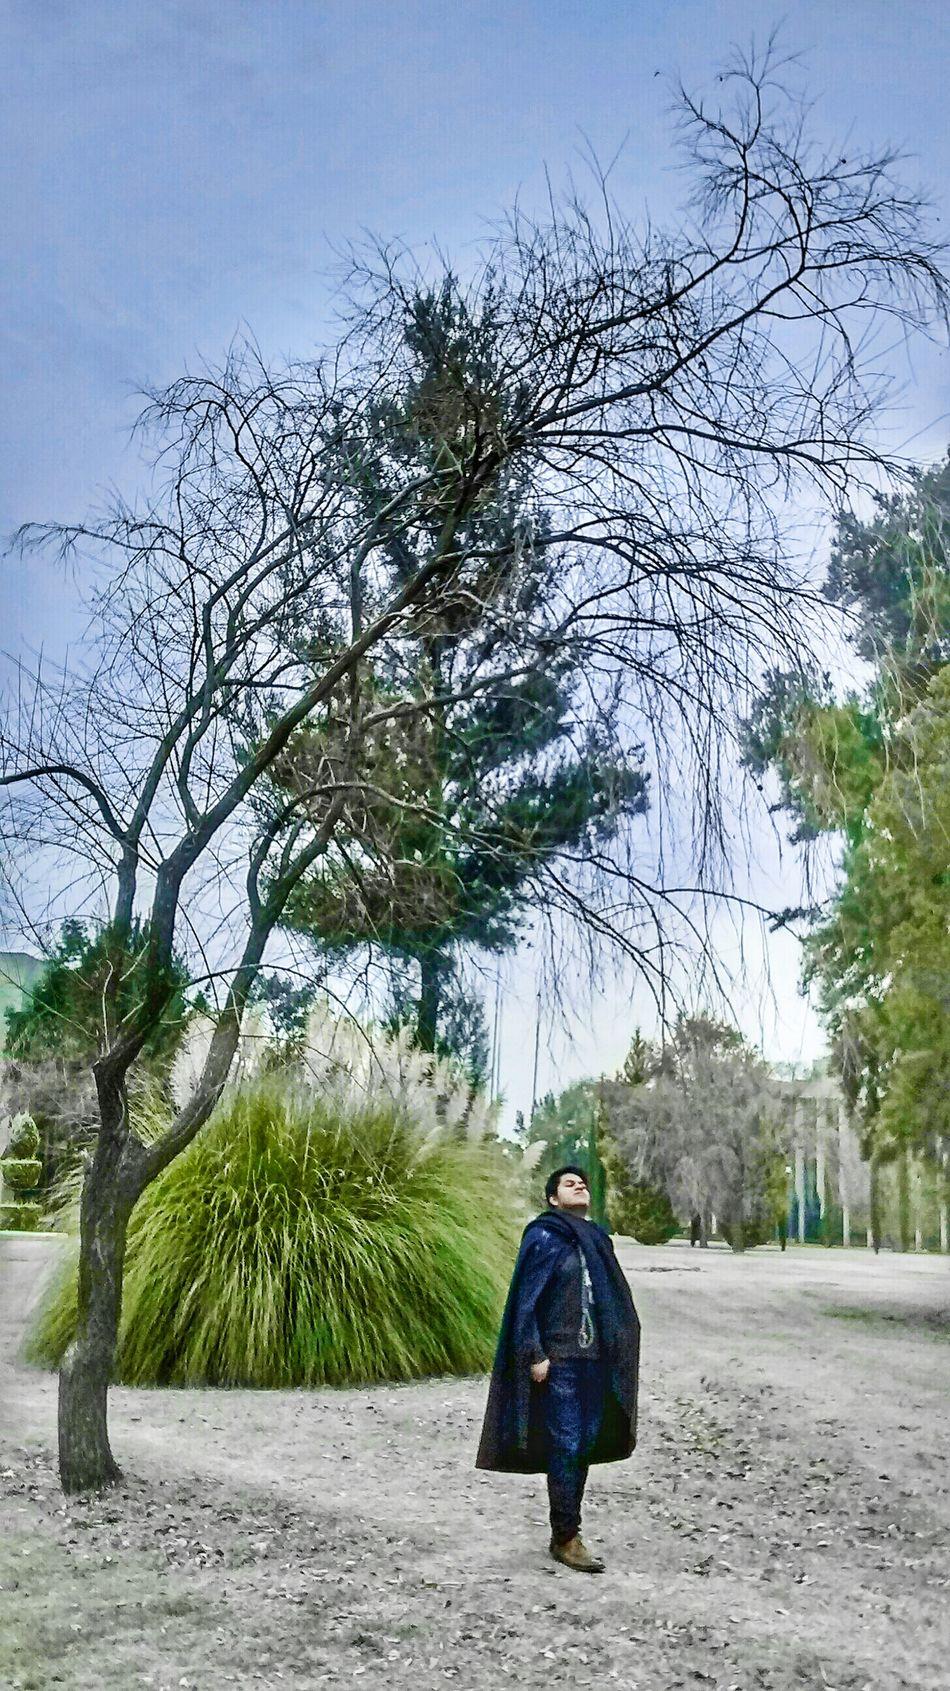 Verde Jardin Nature Arboles Arbol. Madera Mexicolors Freelance Life Natural Naturaleza Rustic Mexicotradicion Traveling Azul Climate Nature Photography Colores Magic Magical Magia Otoñal Magia.